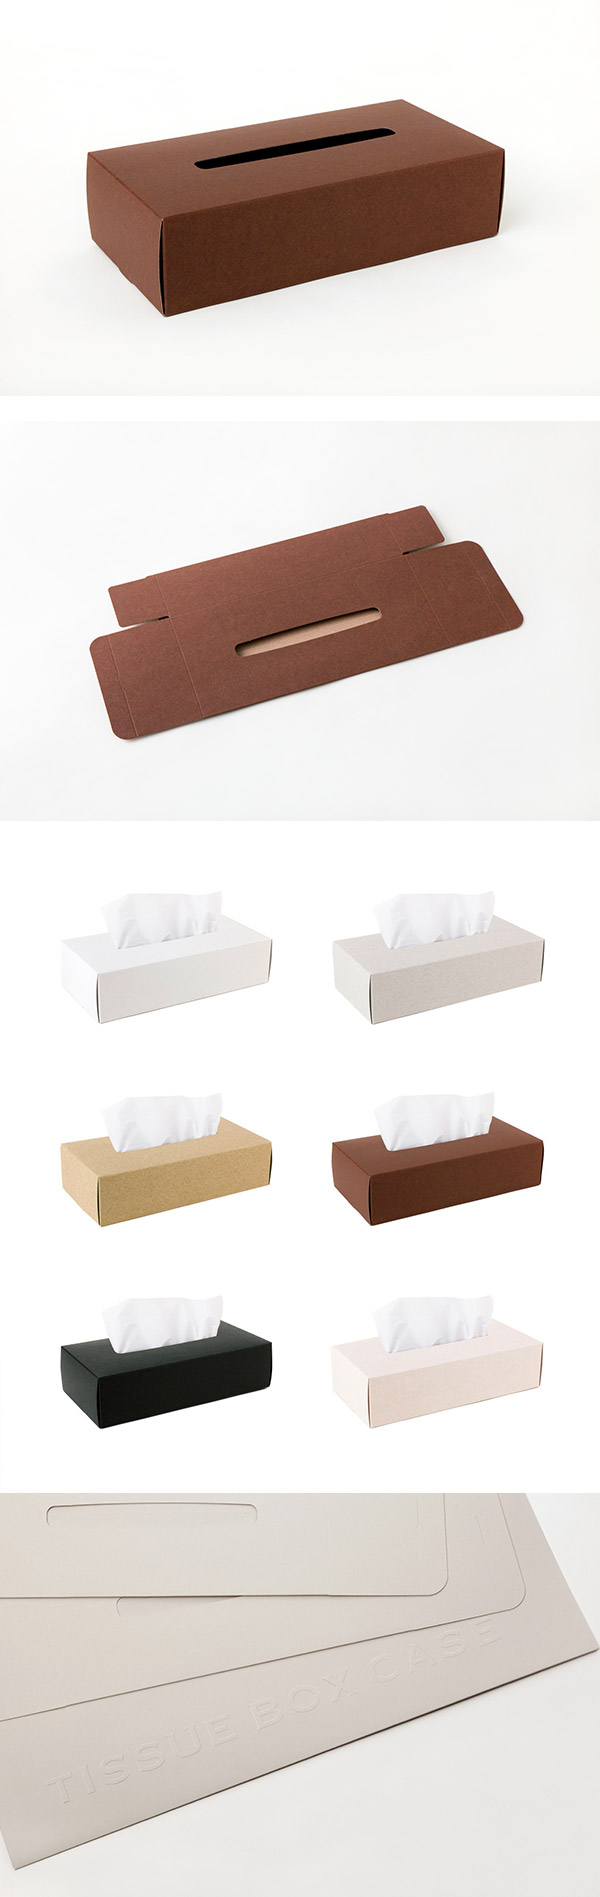 Perrocaliente TISSUE BOX CASE 面紙盒 2入 棕色